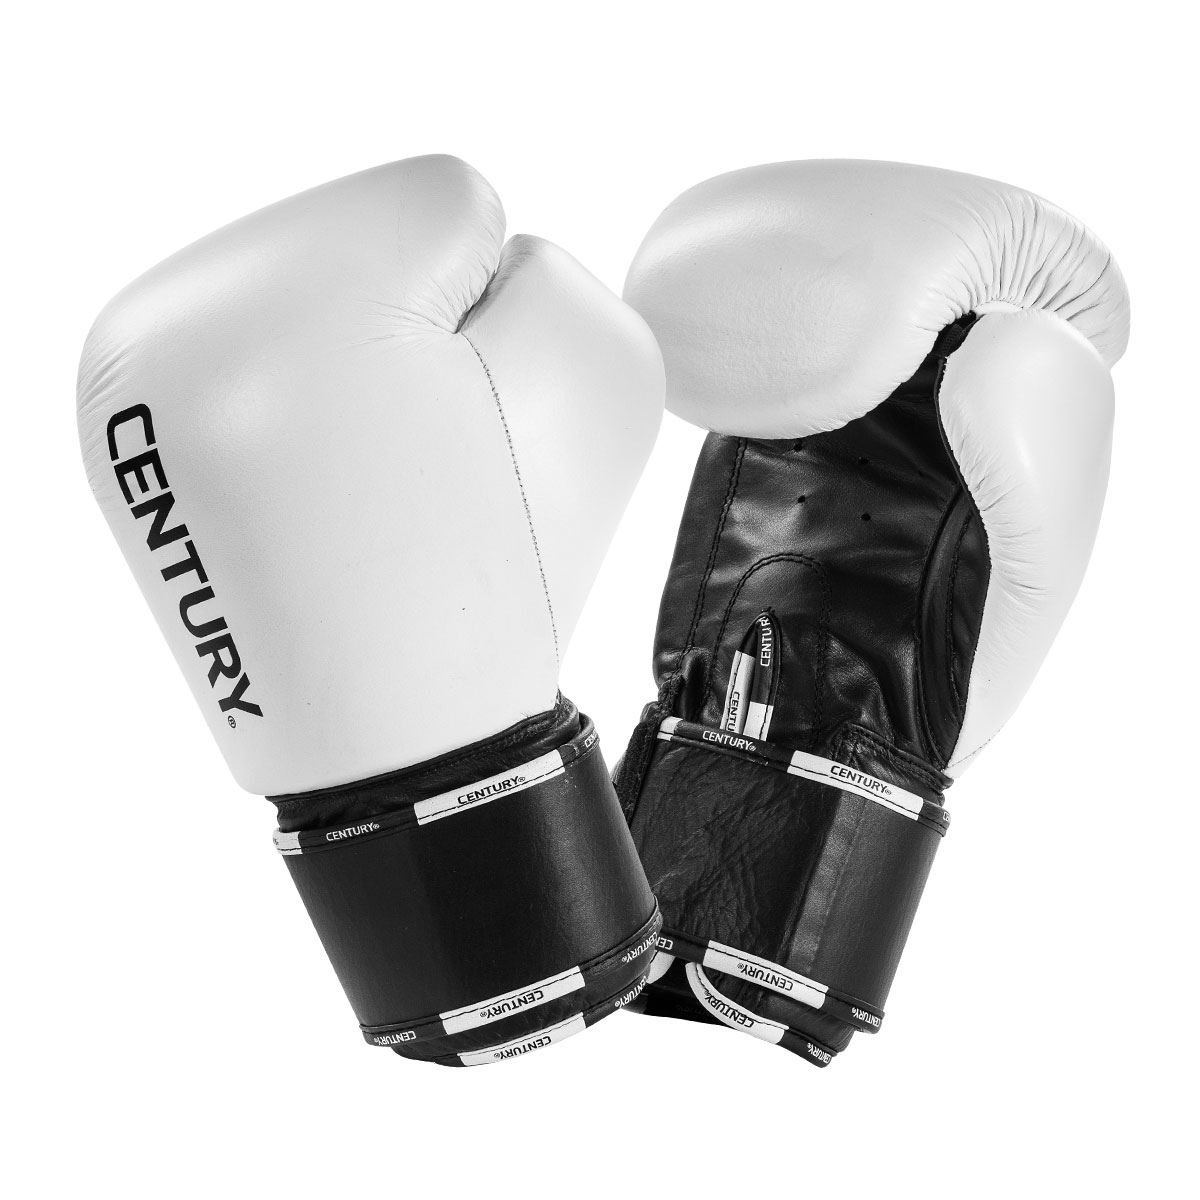 Century CREED Heavy Bagトレーニング手袋  18 Ounces